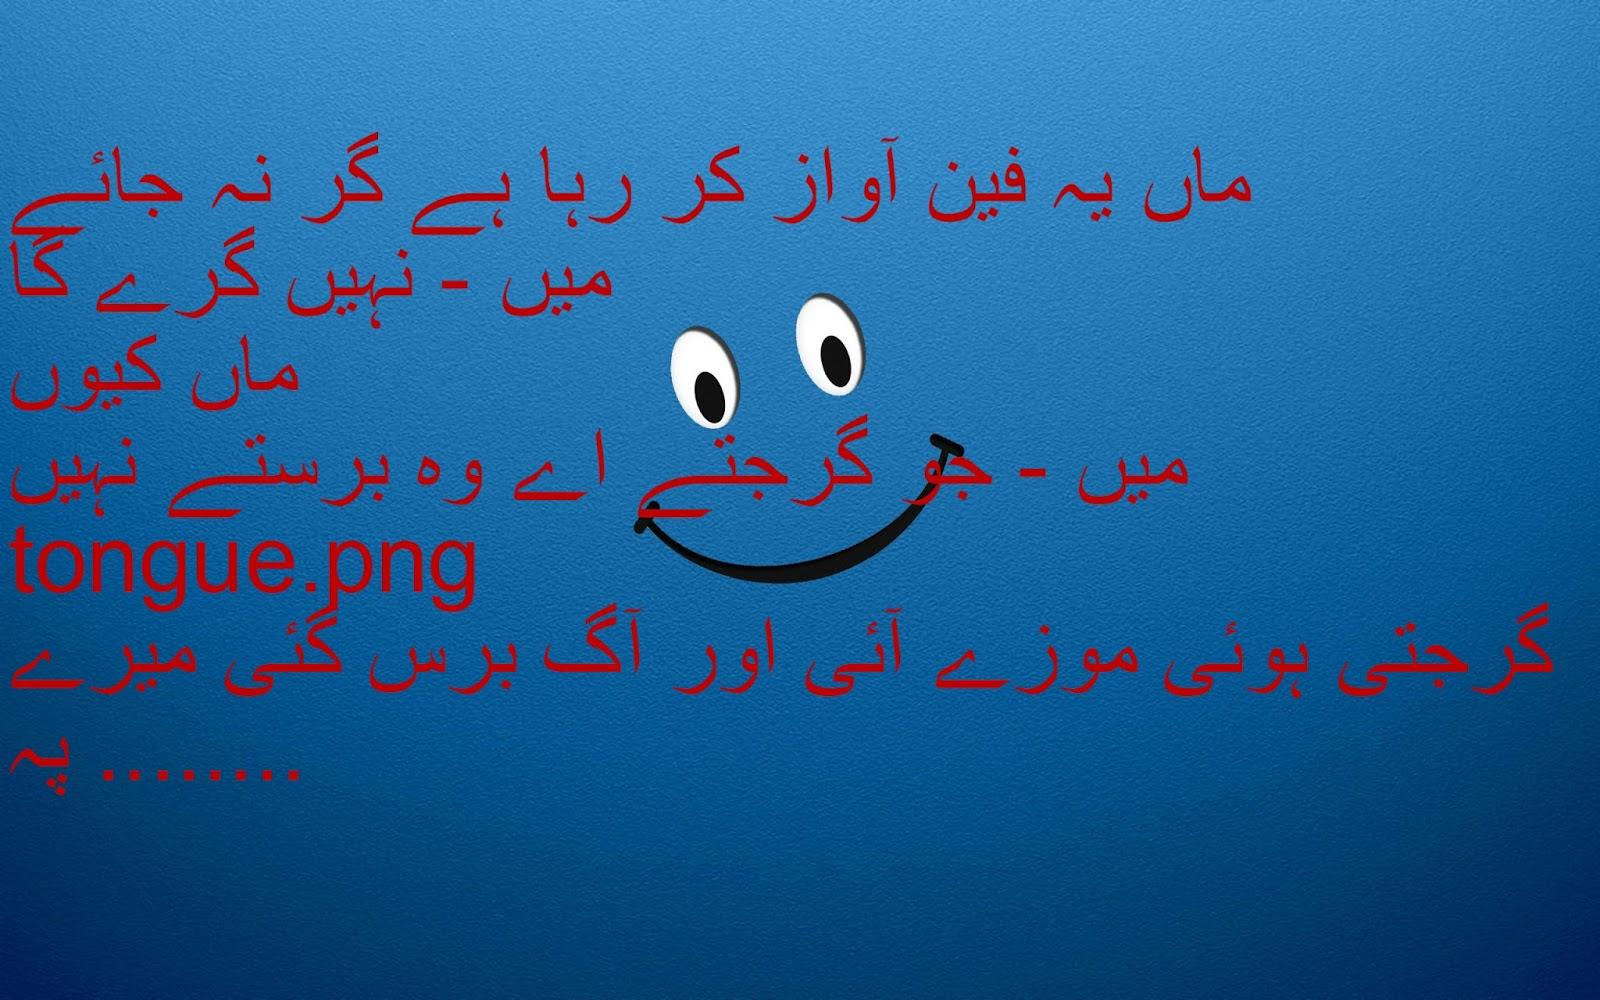 Funny Sms In Urduimage Rdu Jokes Imagefunny Urdu Jokes Facebookfunny Urdu Jokes In Englishfunny Urdu Jokes For Adultsfunny Urdu Jokes Smslatest